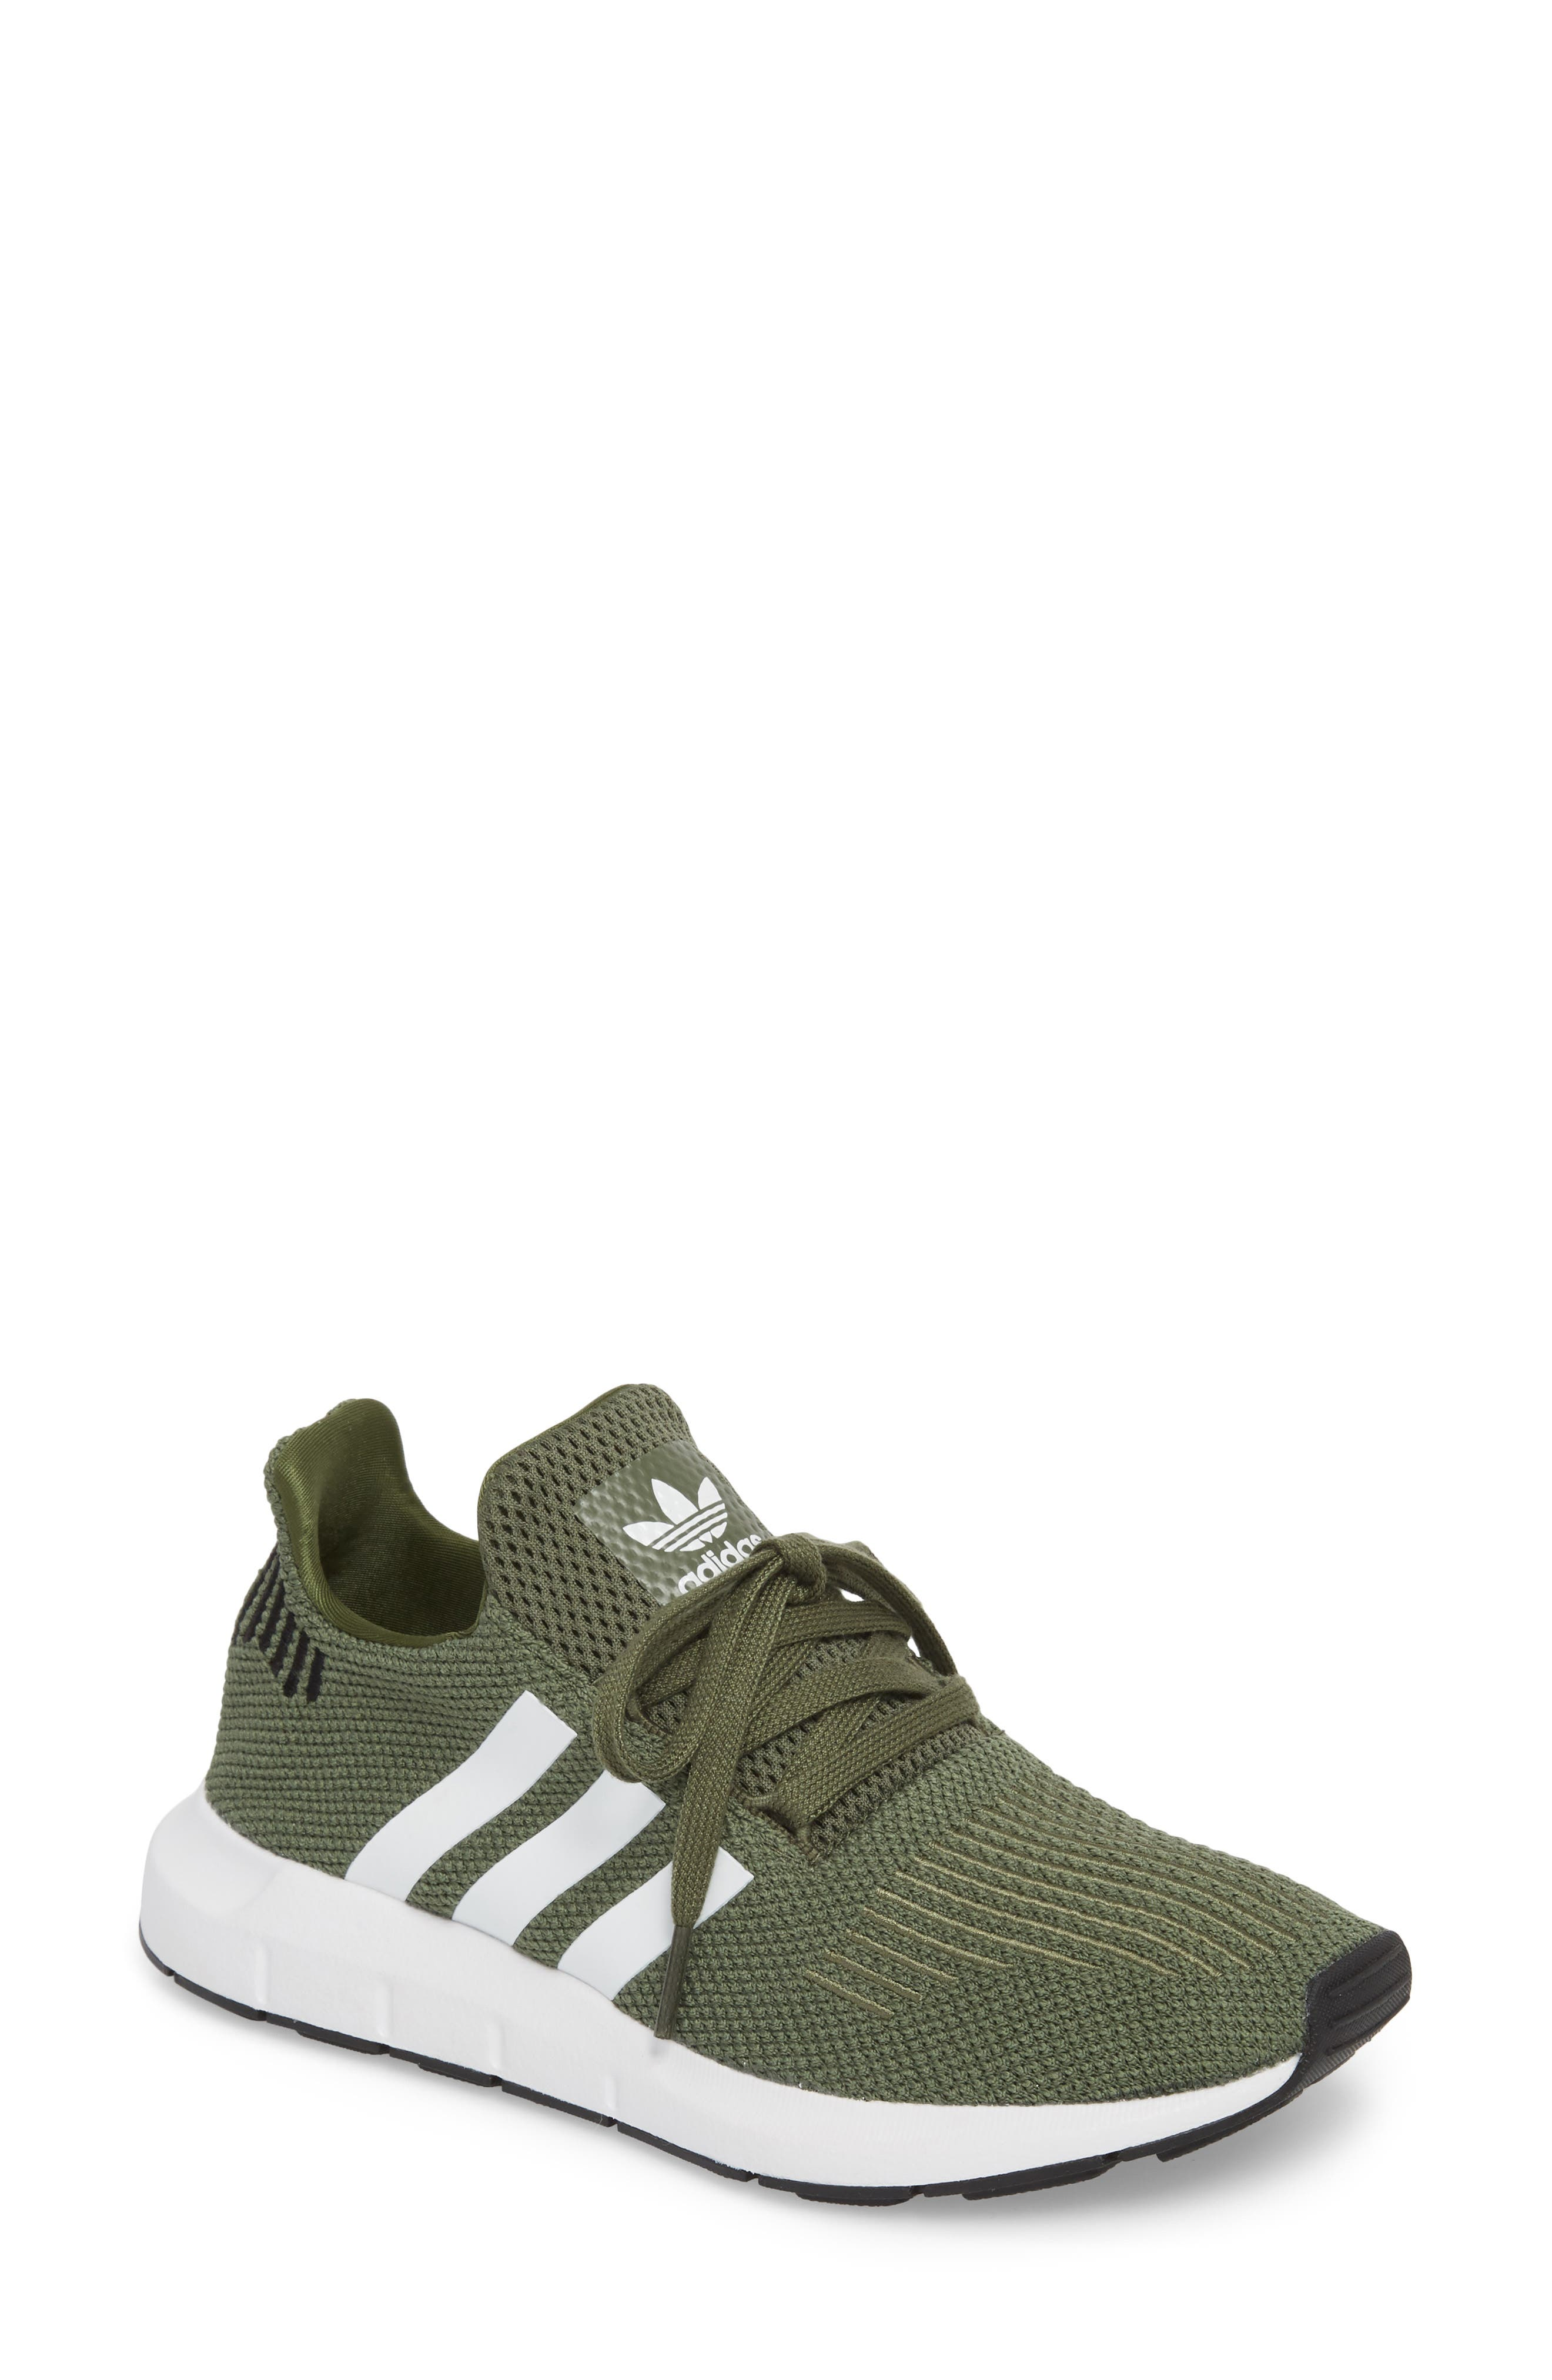 Swift Run Sneaker,                             Main thumbnail 1, color,                             Base Green/ White/ Black